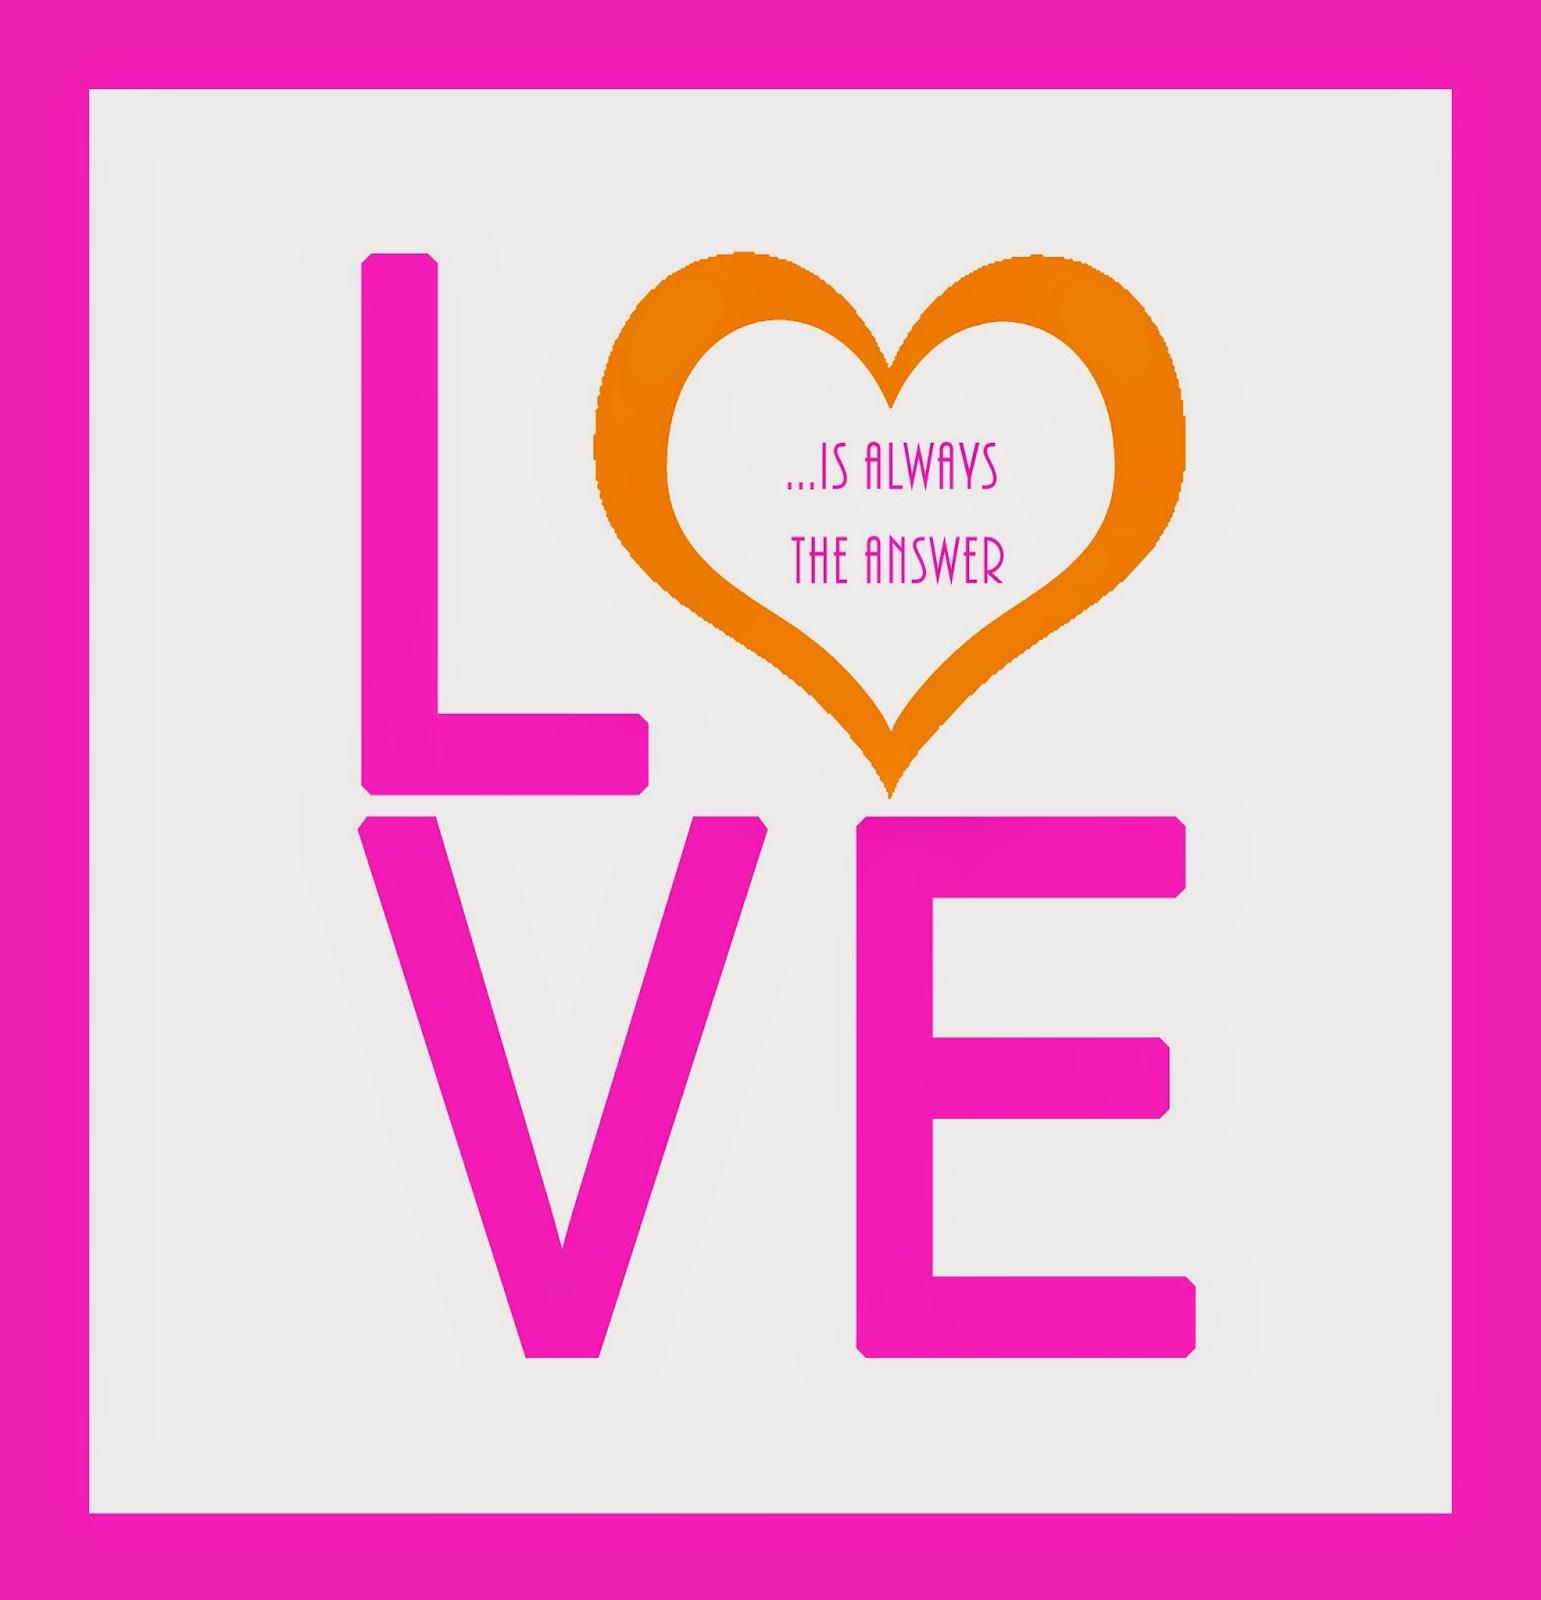 Freude am Kochen - Love is always the answer